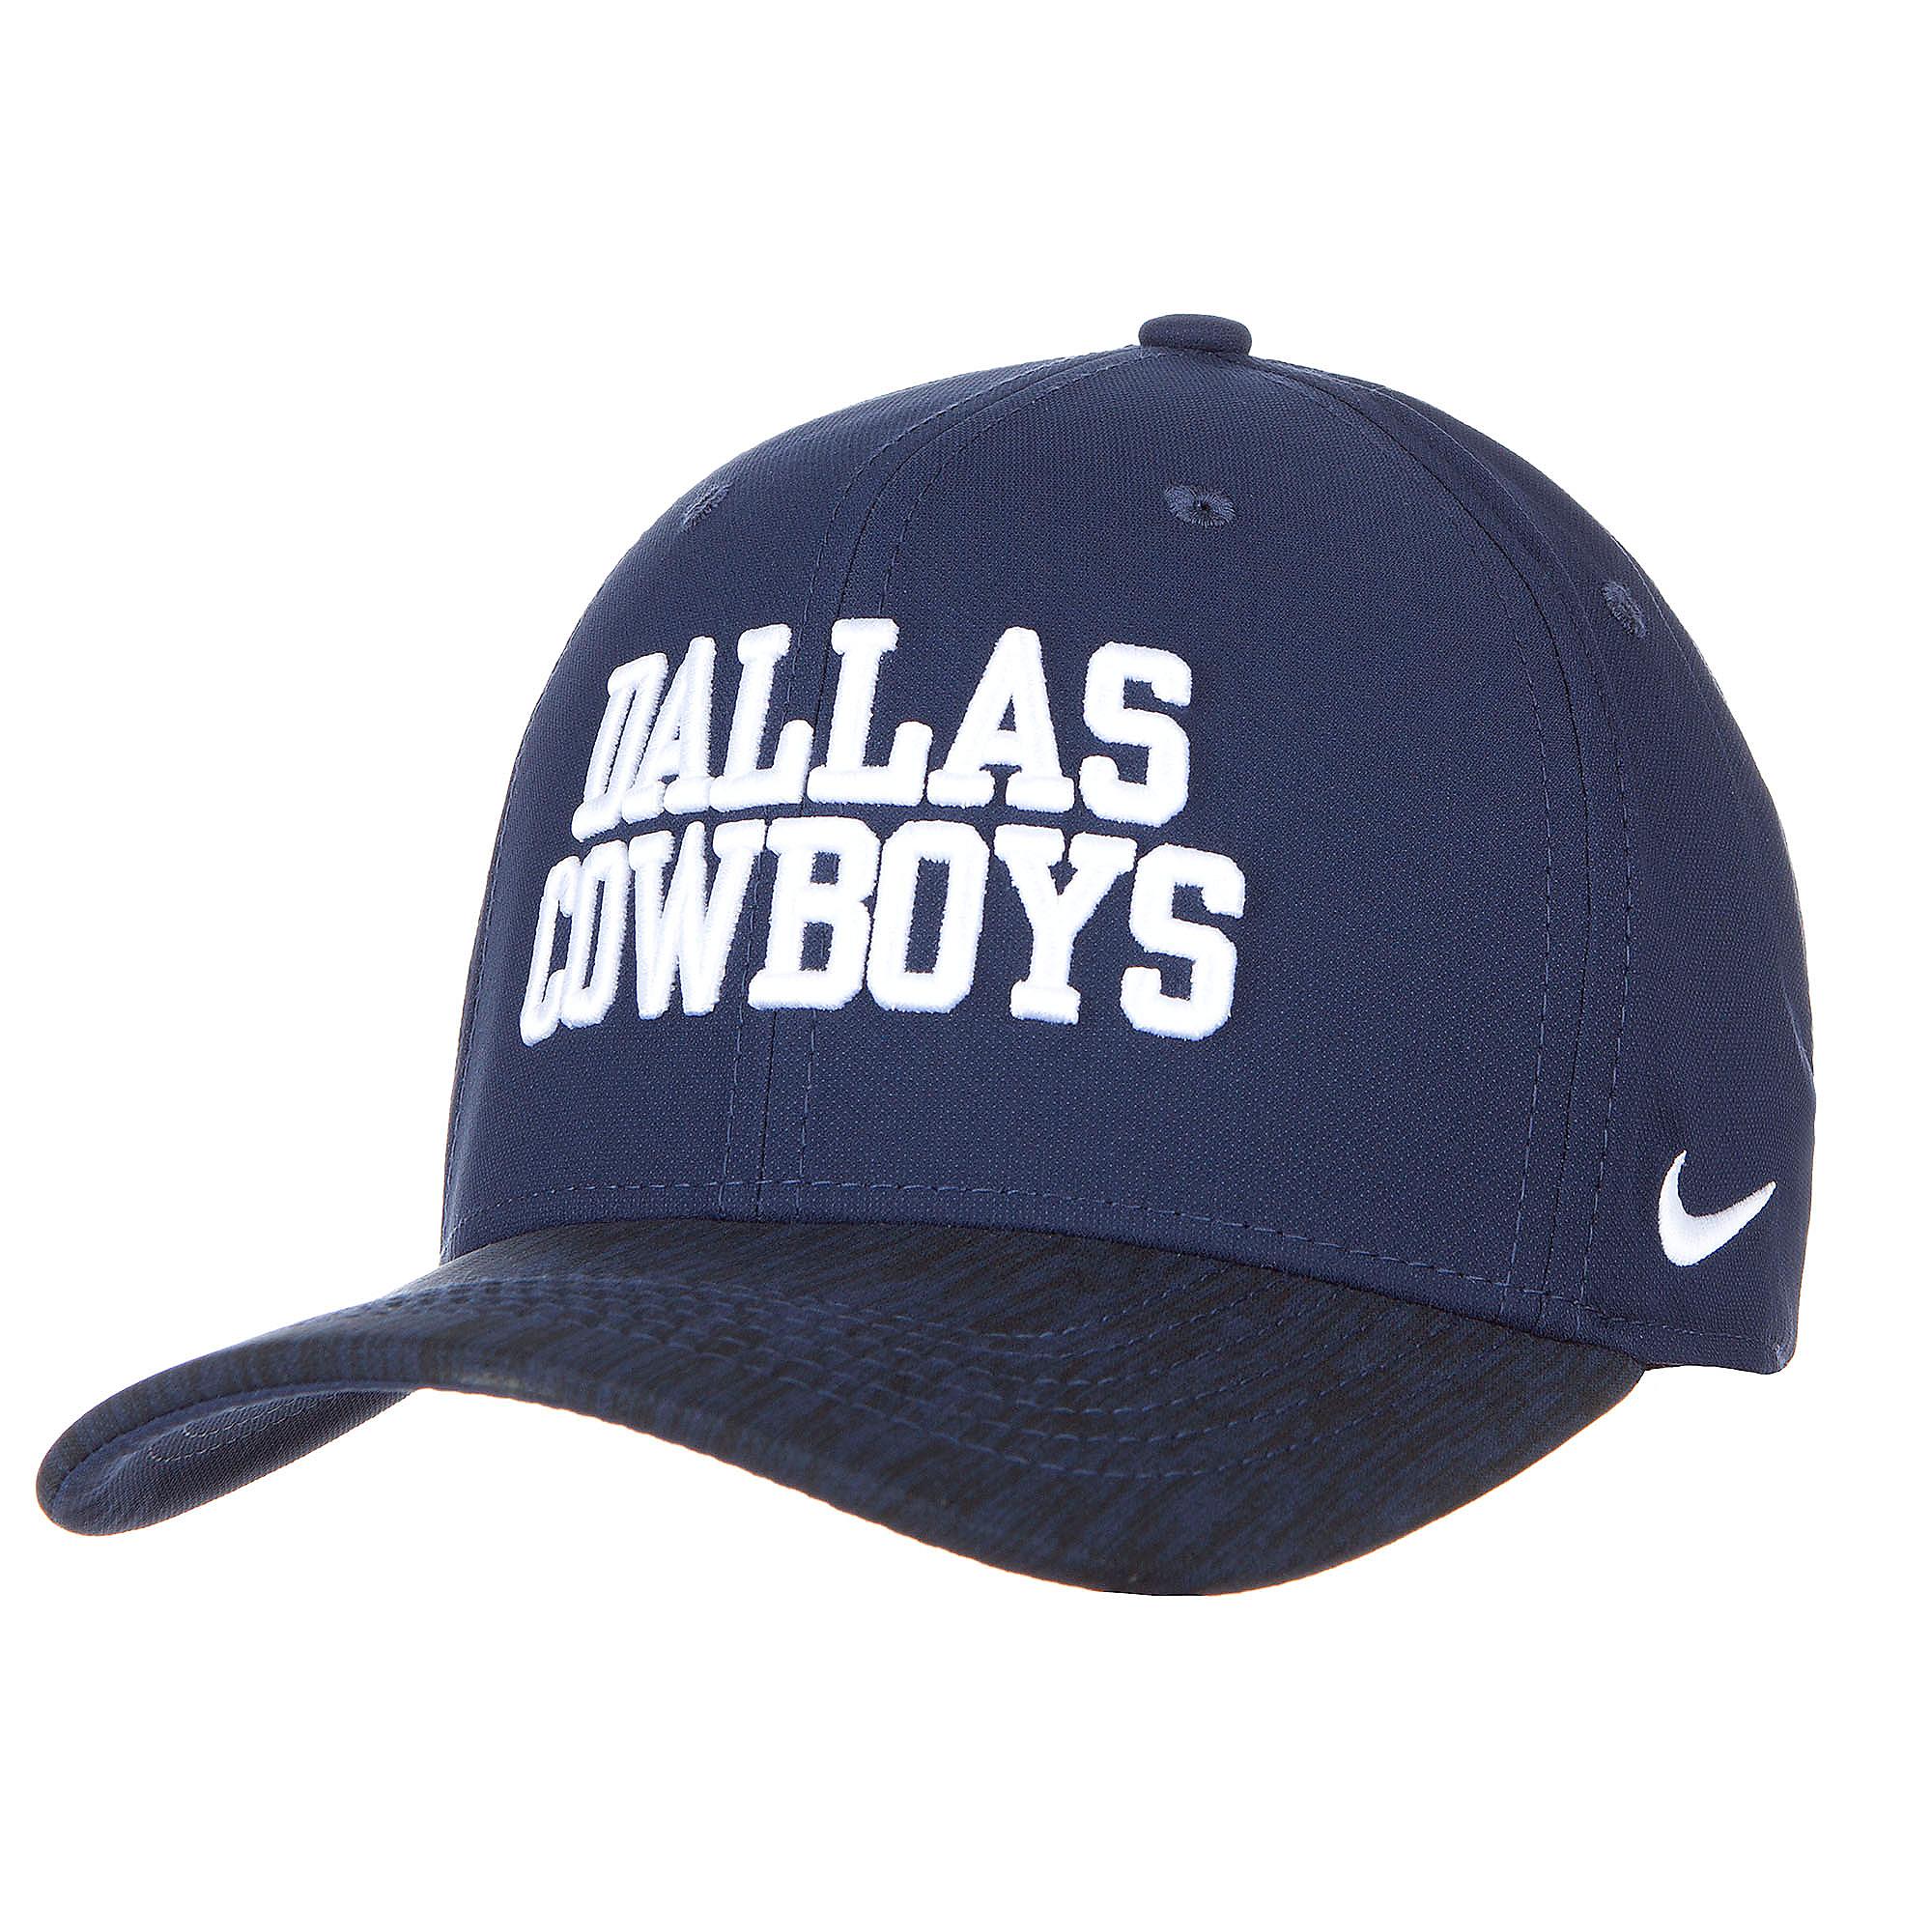 d989530415db1 where to buy dallas cowboys nike cap 78d80 0b806